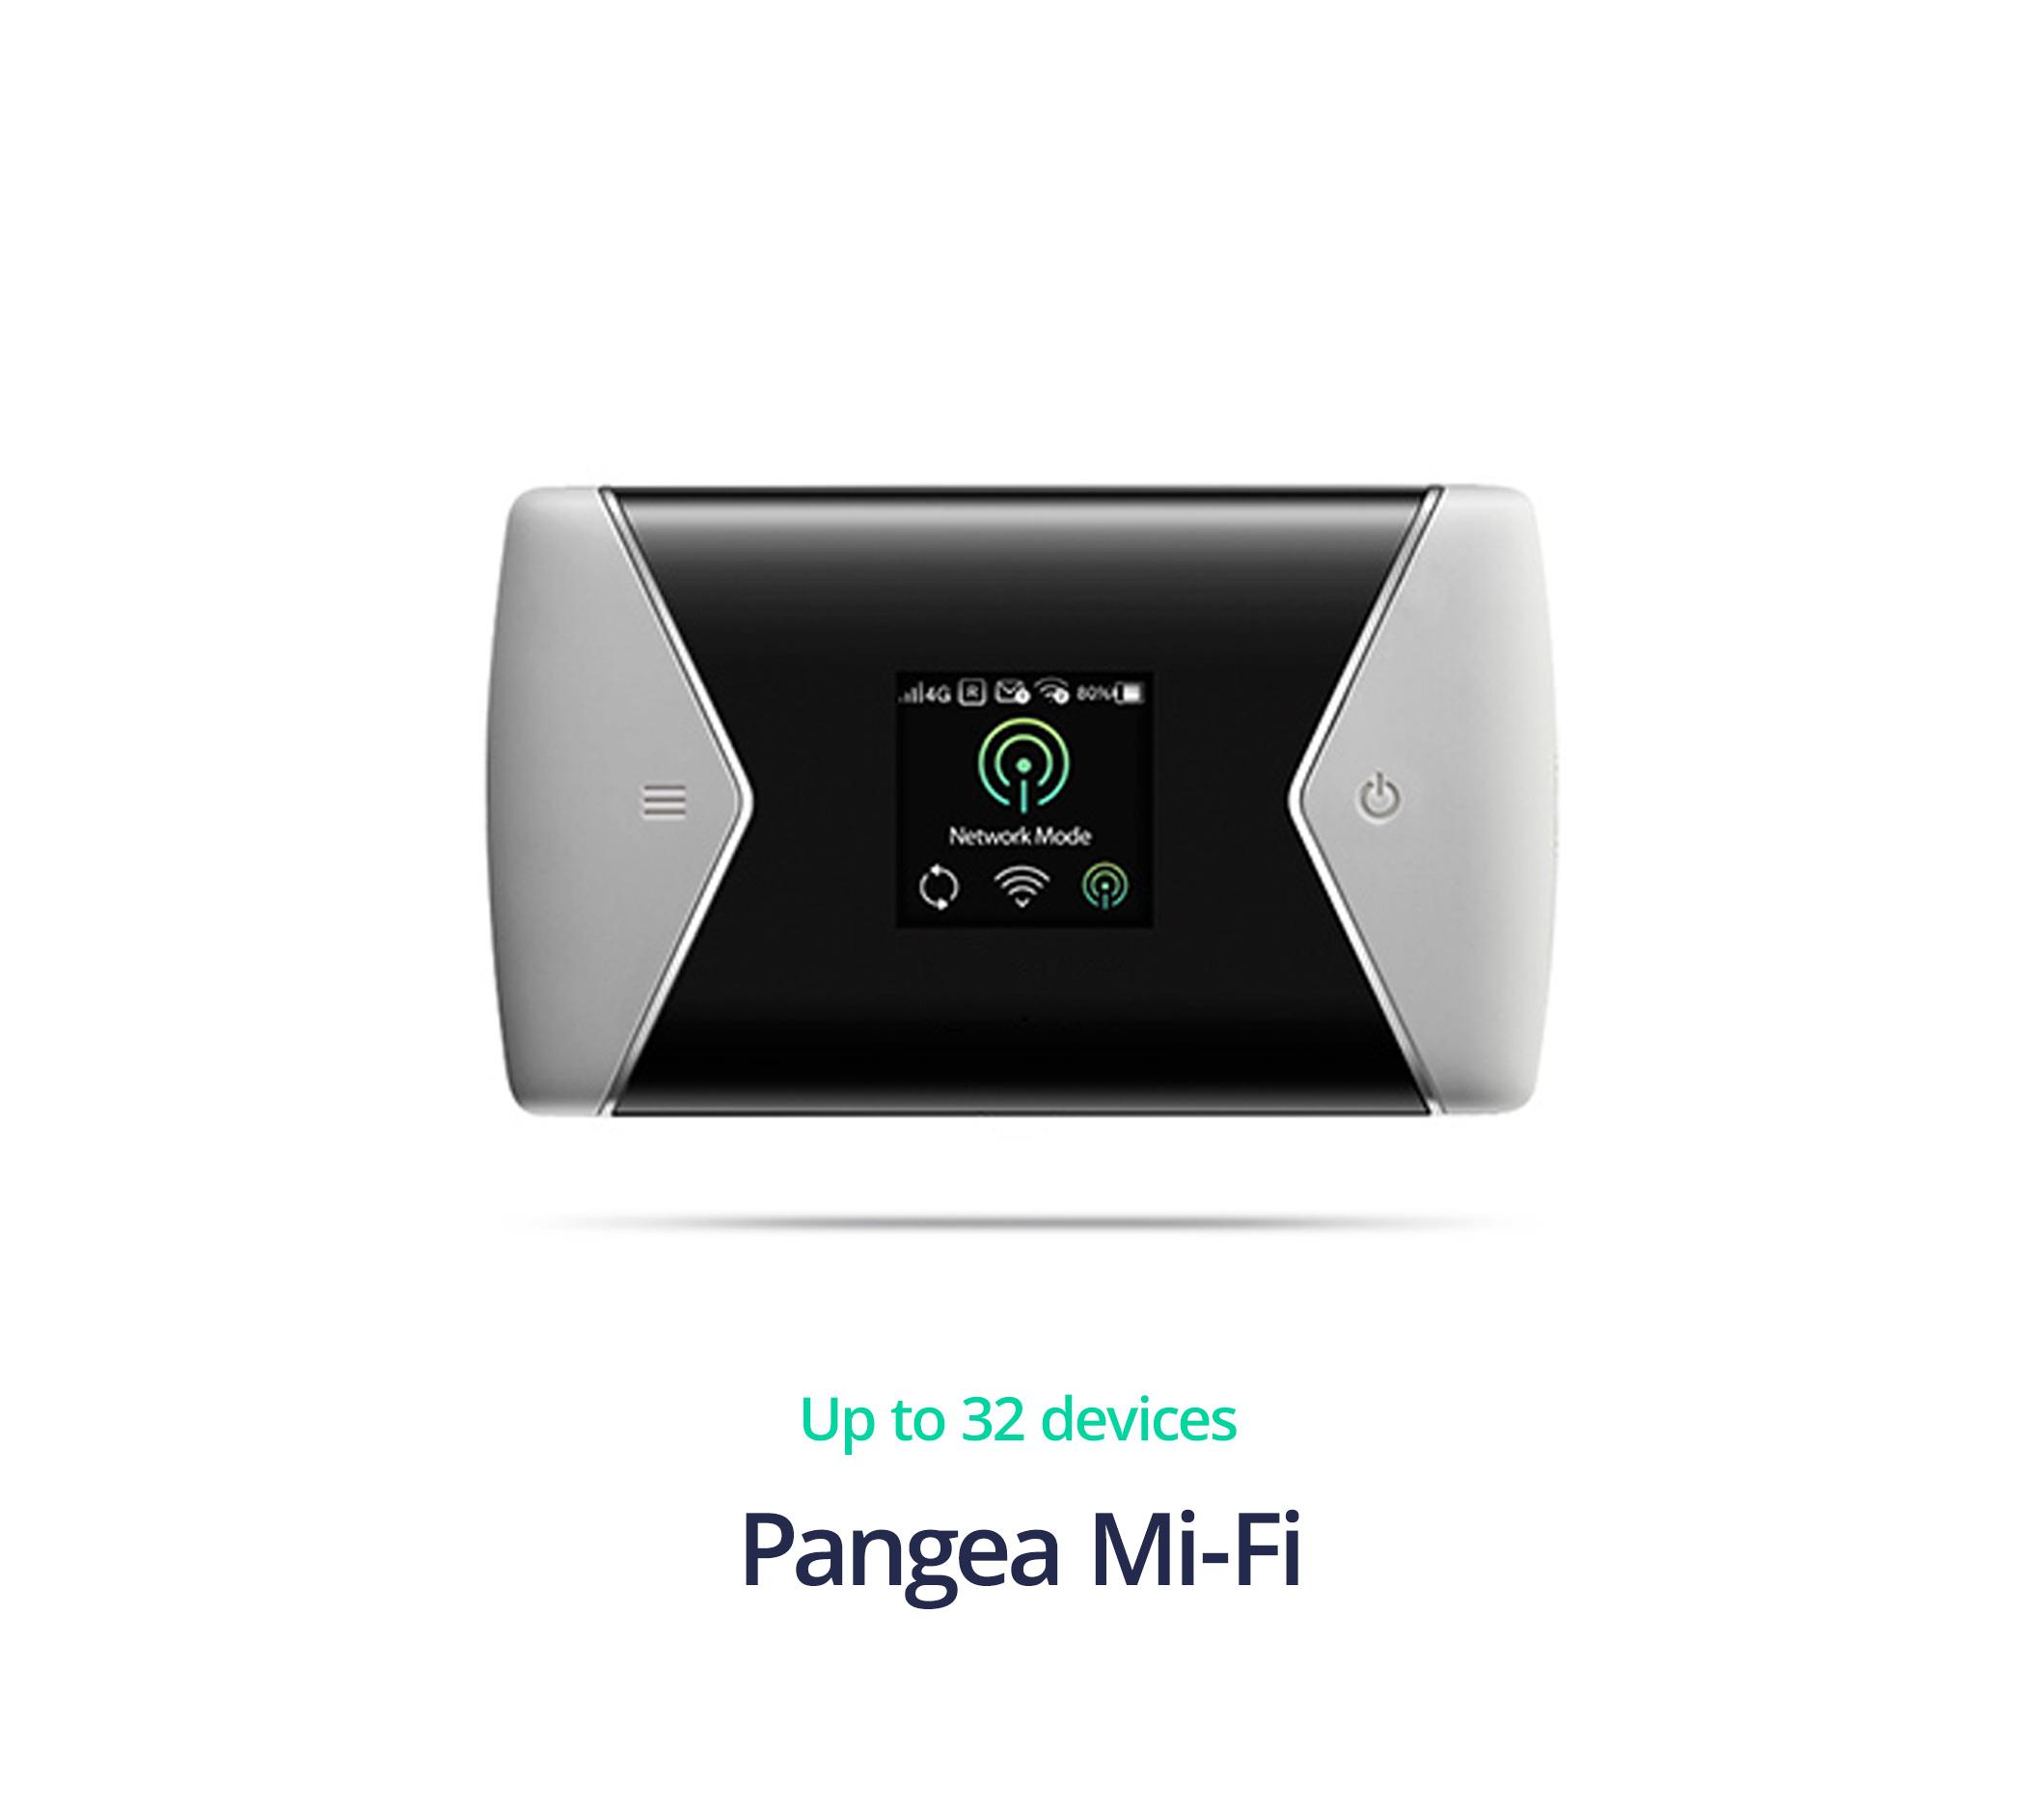 Pangea 4G Enterprise router - Pangea Mi-Fi link